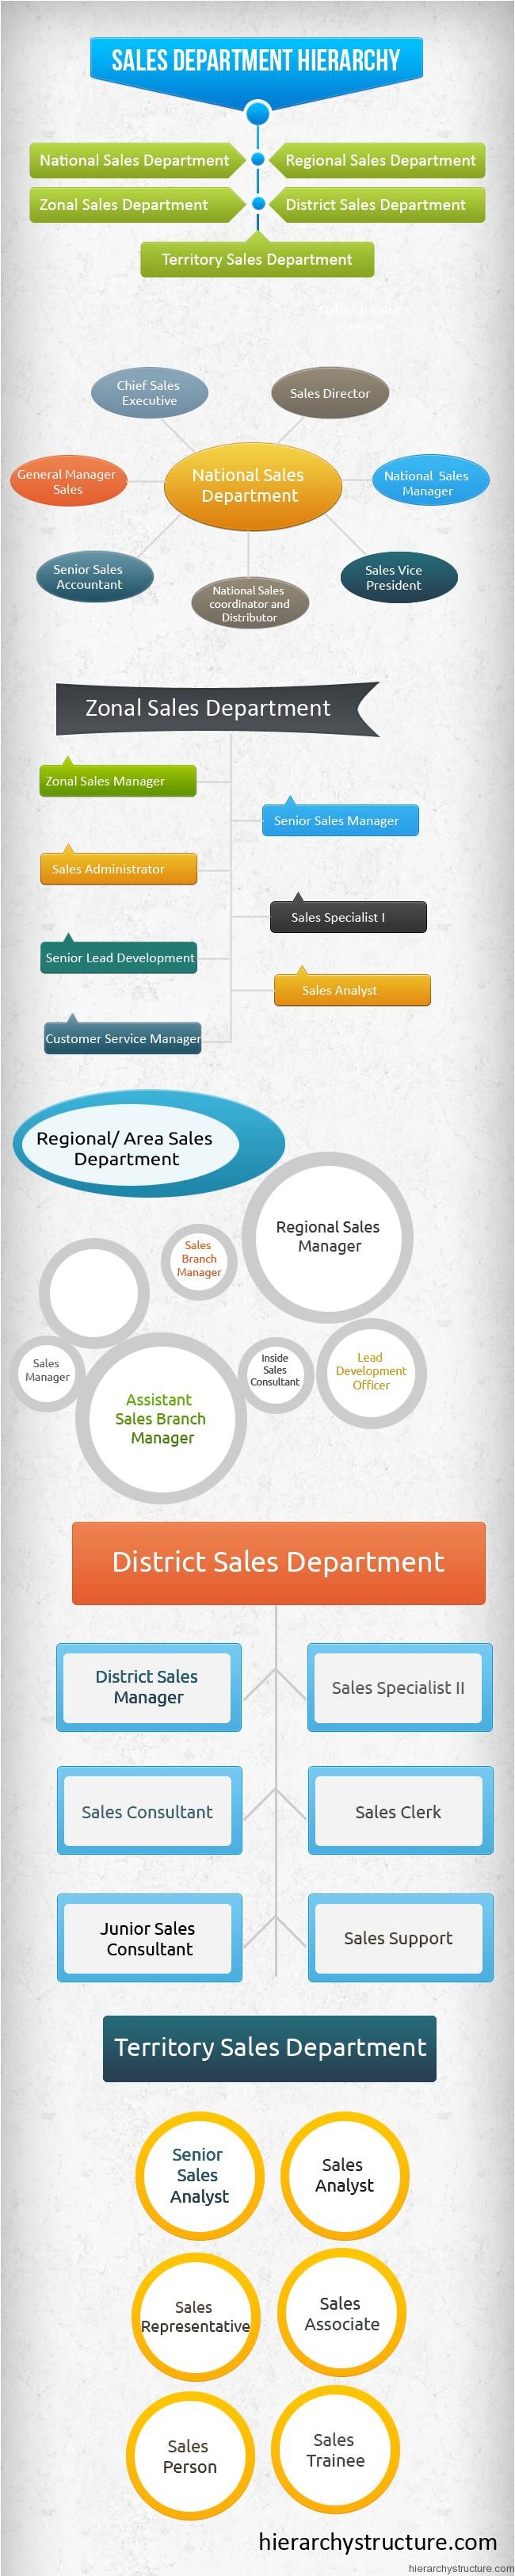 Sales Department Hierarchy Hierarchy Organizational Structure Sales Jobs